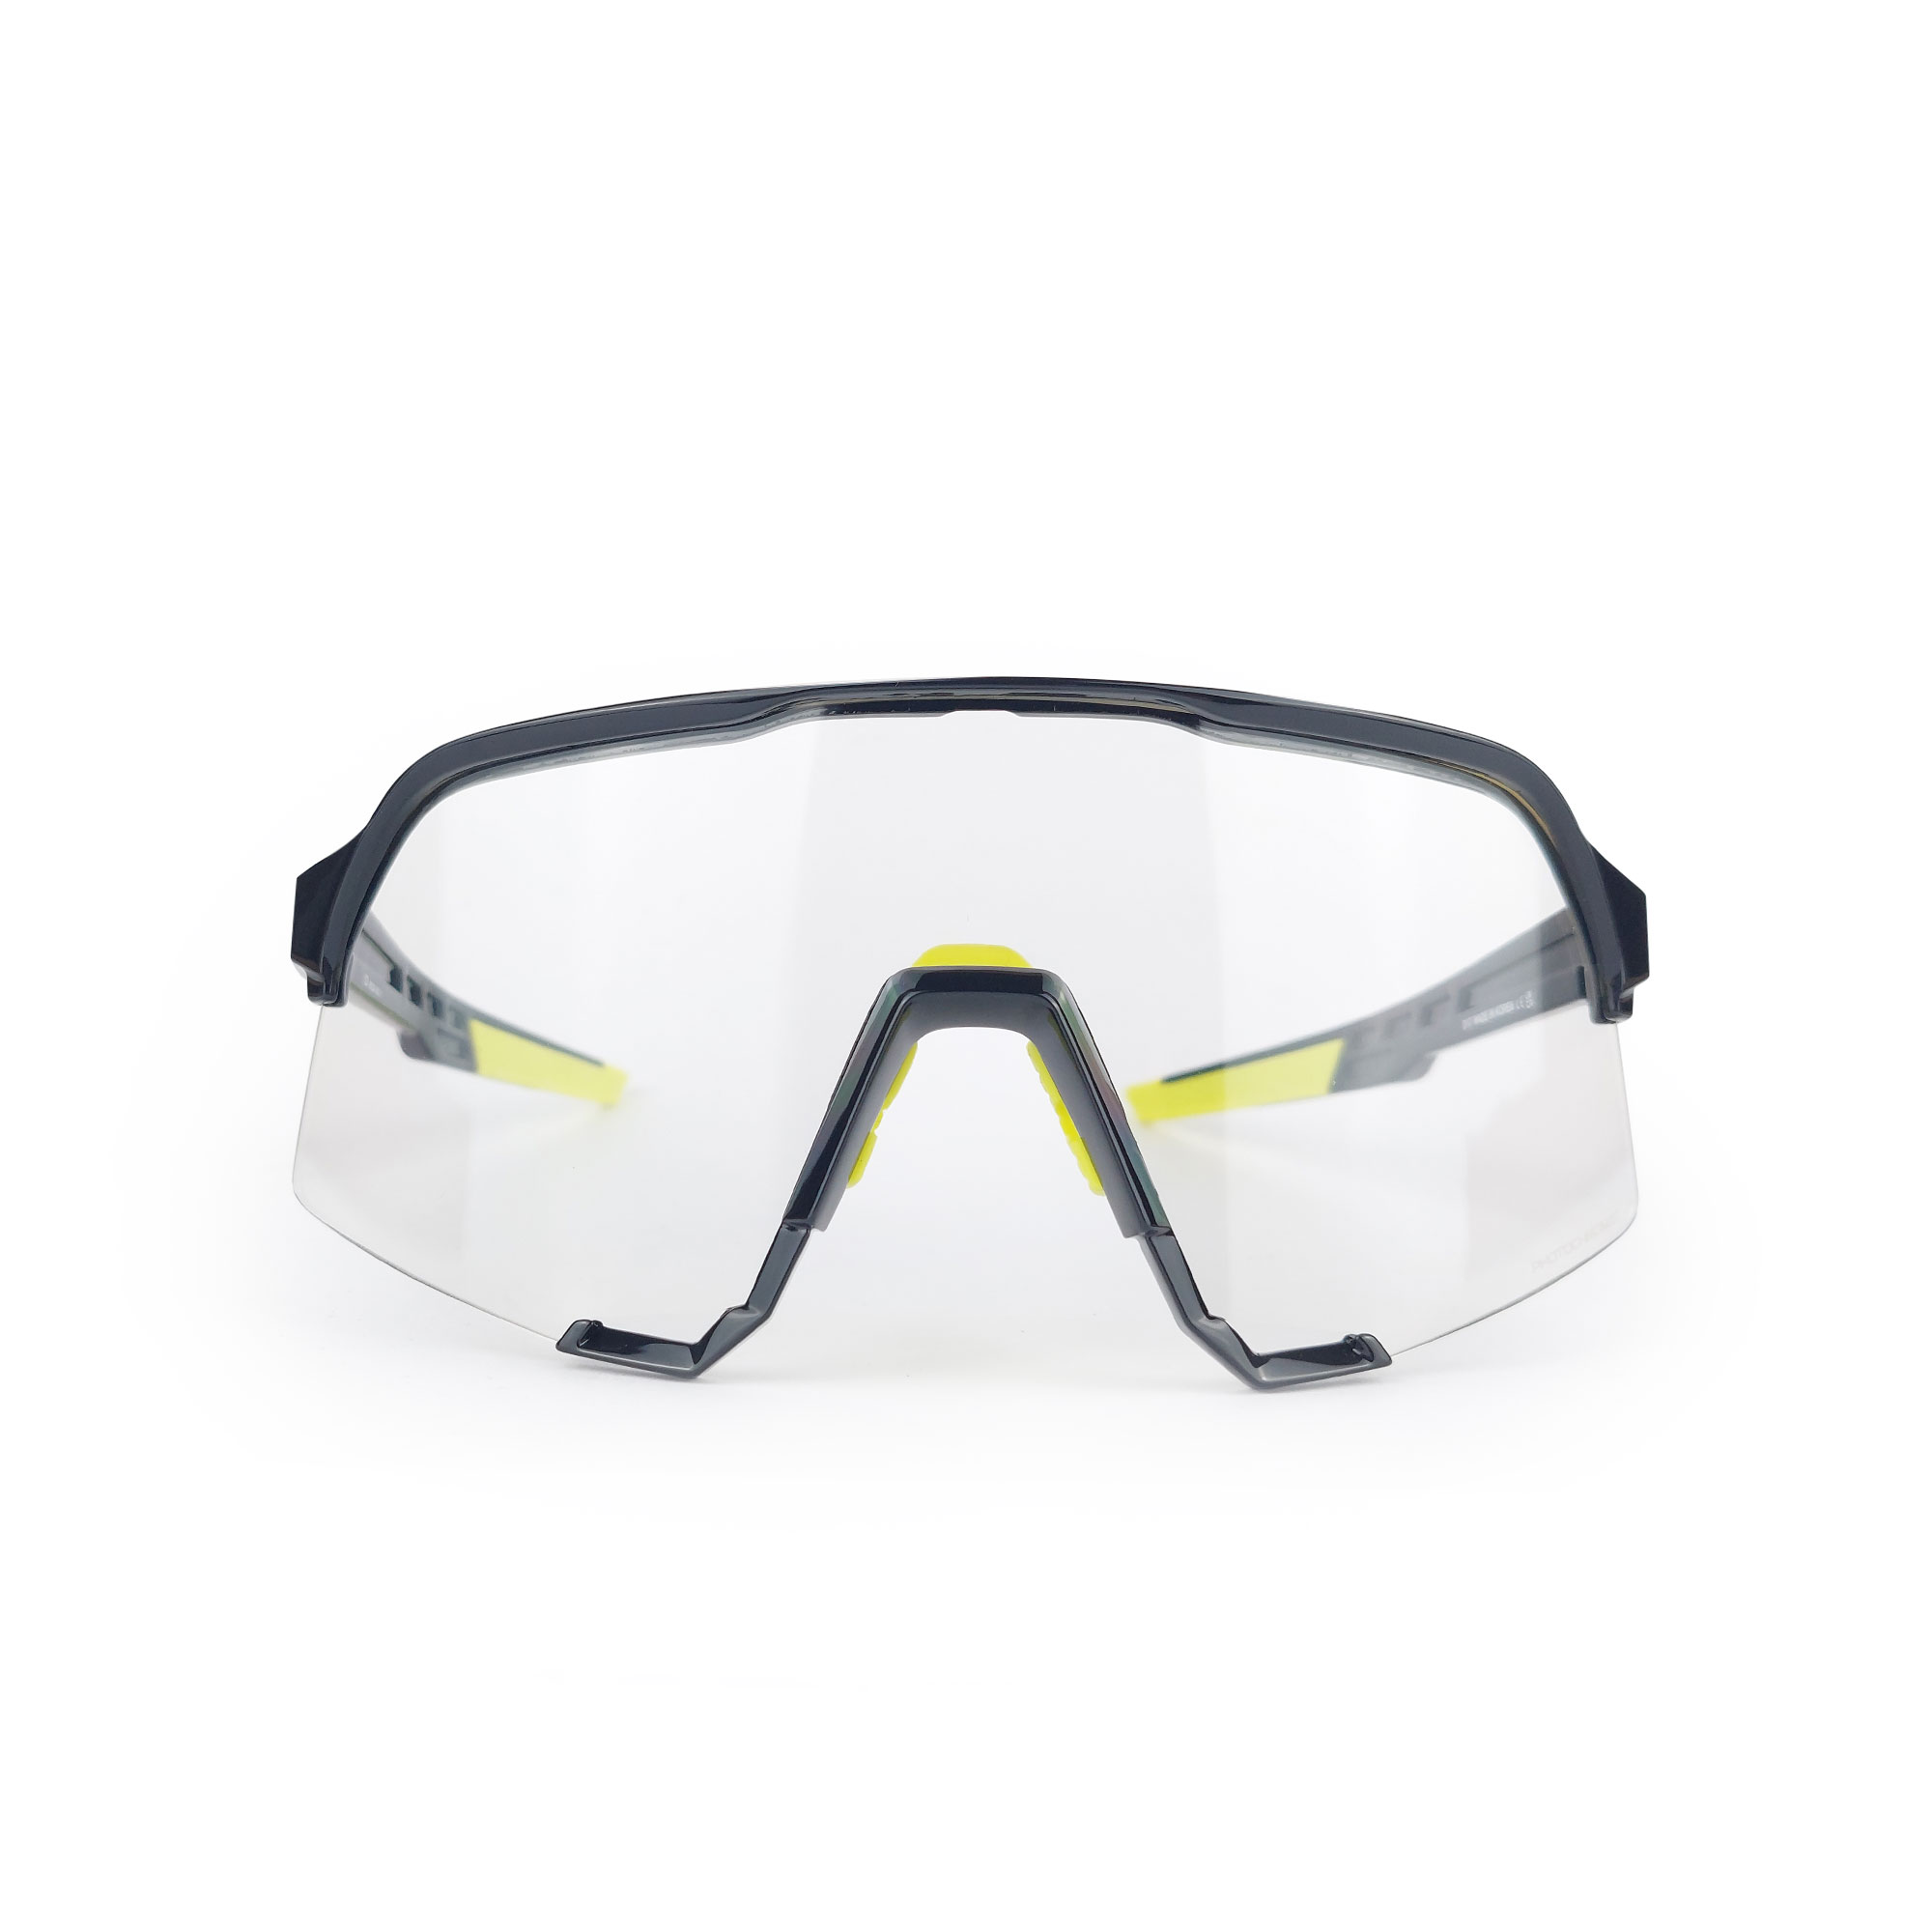 Oculos 100% S3 1 Lente Fotocromática Ciclismo